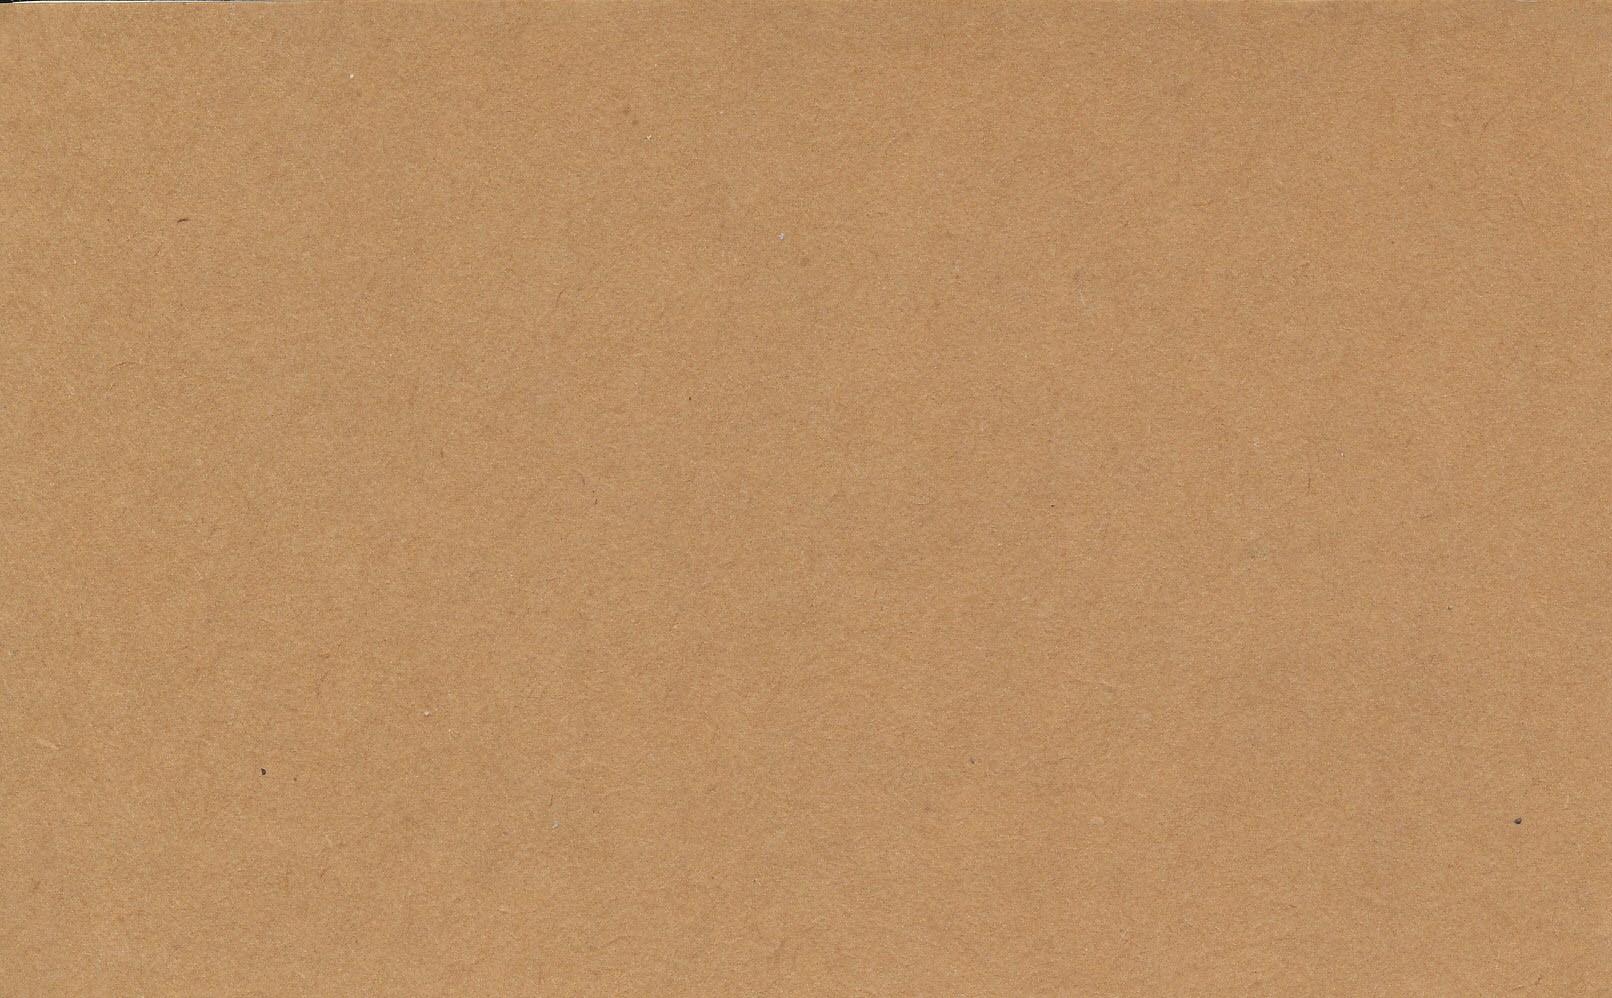 Kraft Paper Scan For   kraft paper texture 1612x998